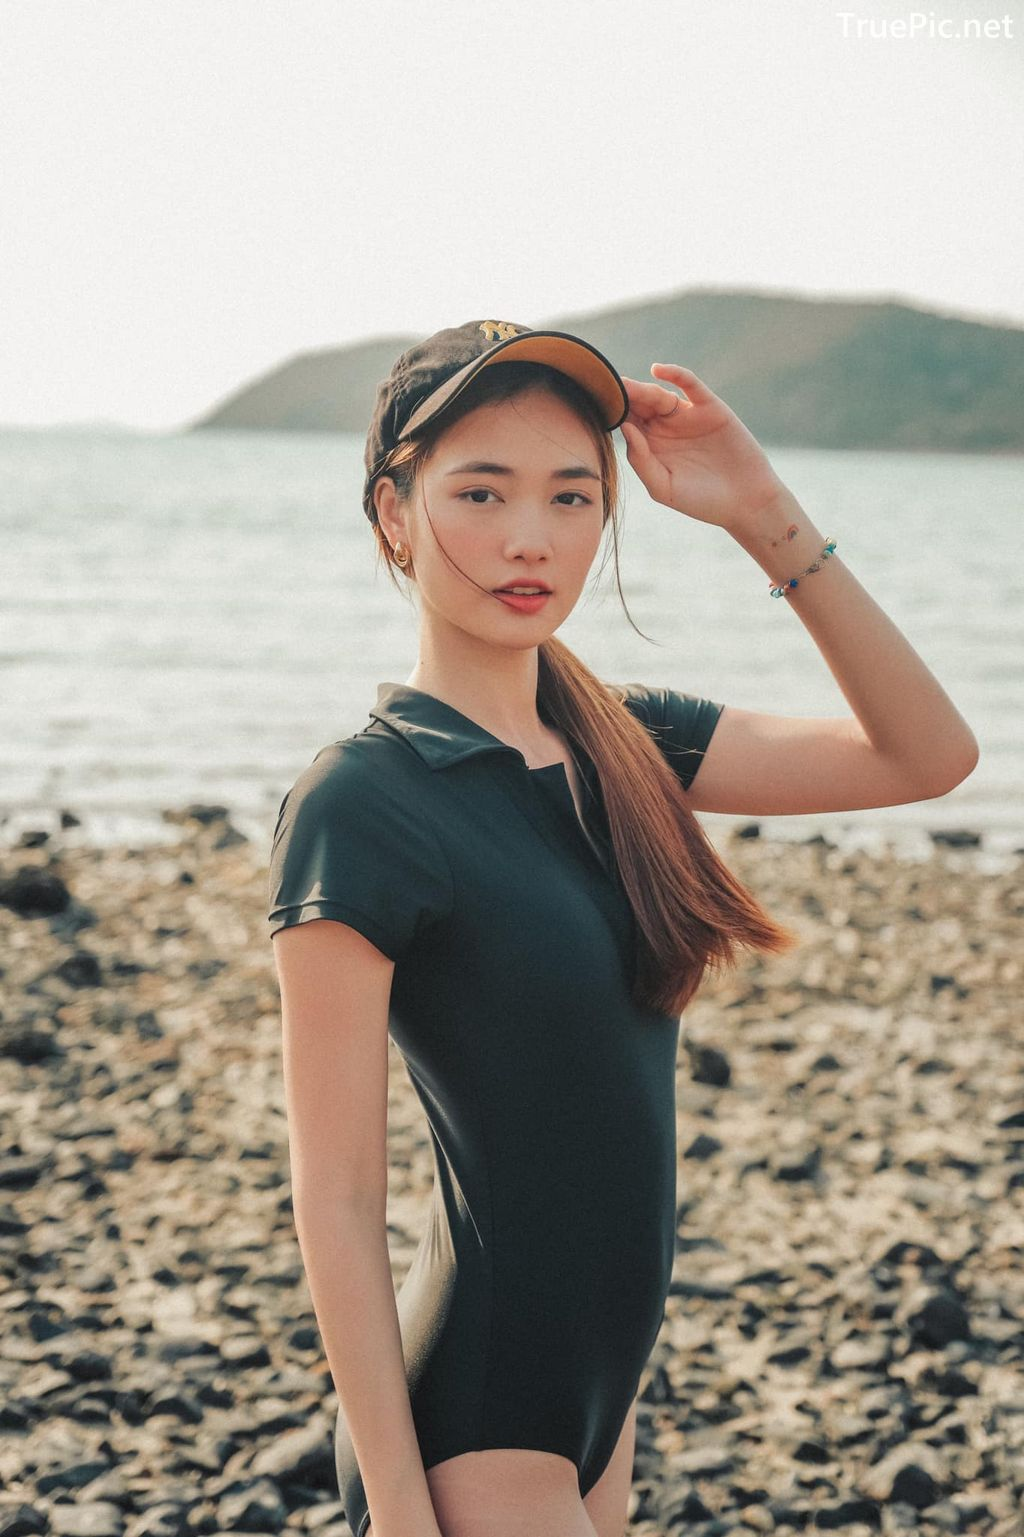 Image-Miss-Teen-Thailand-Kanyarat-Ruangrung-Black-Swimsuit-TruePic.net- Picture-9